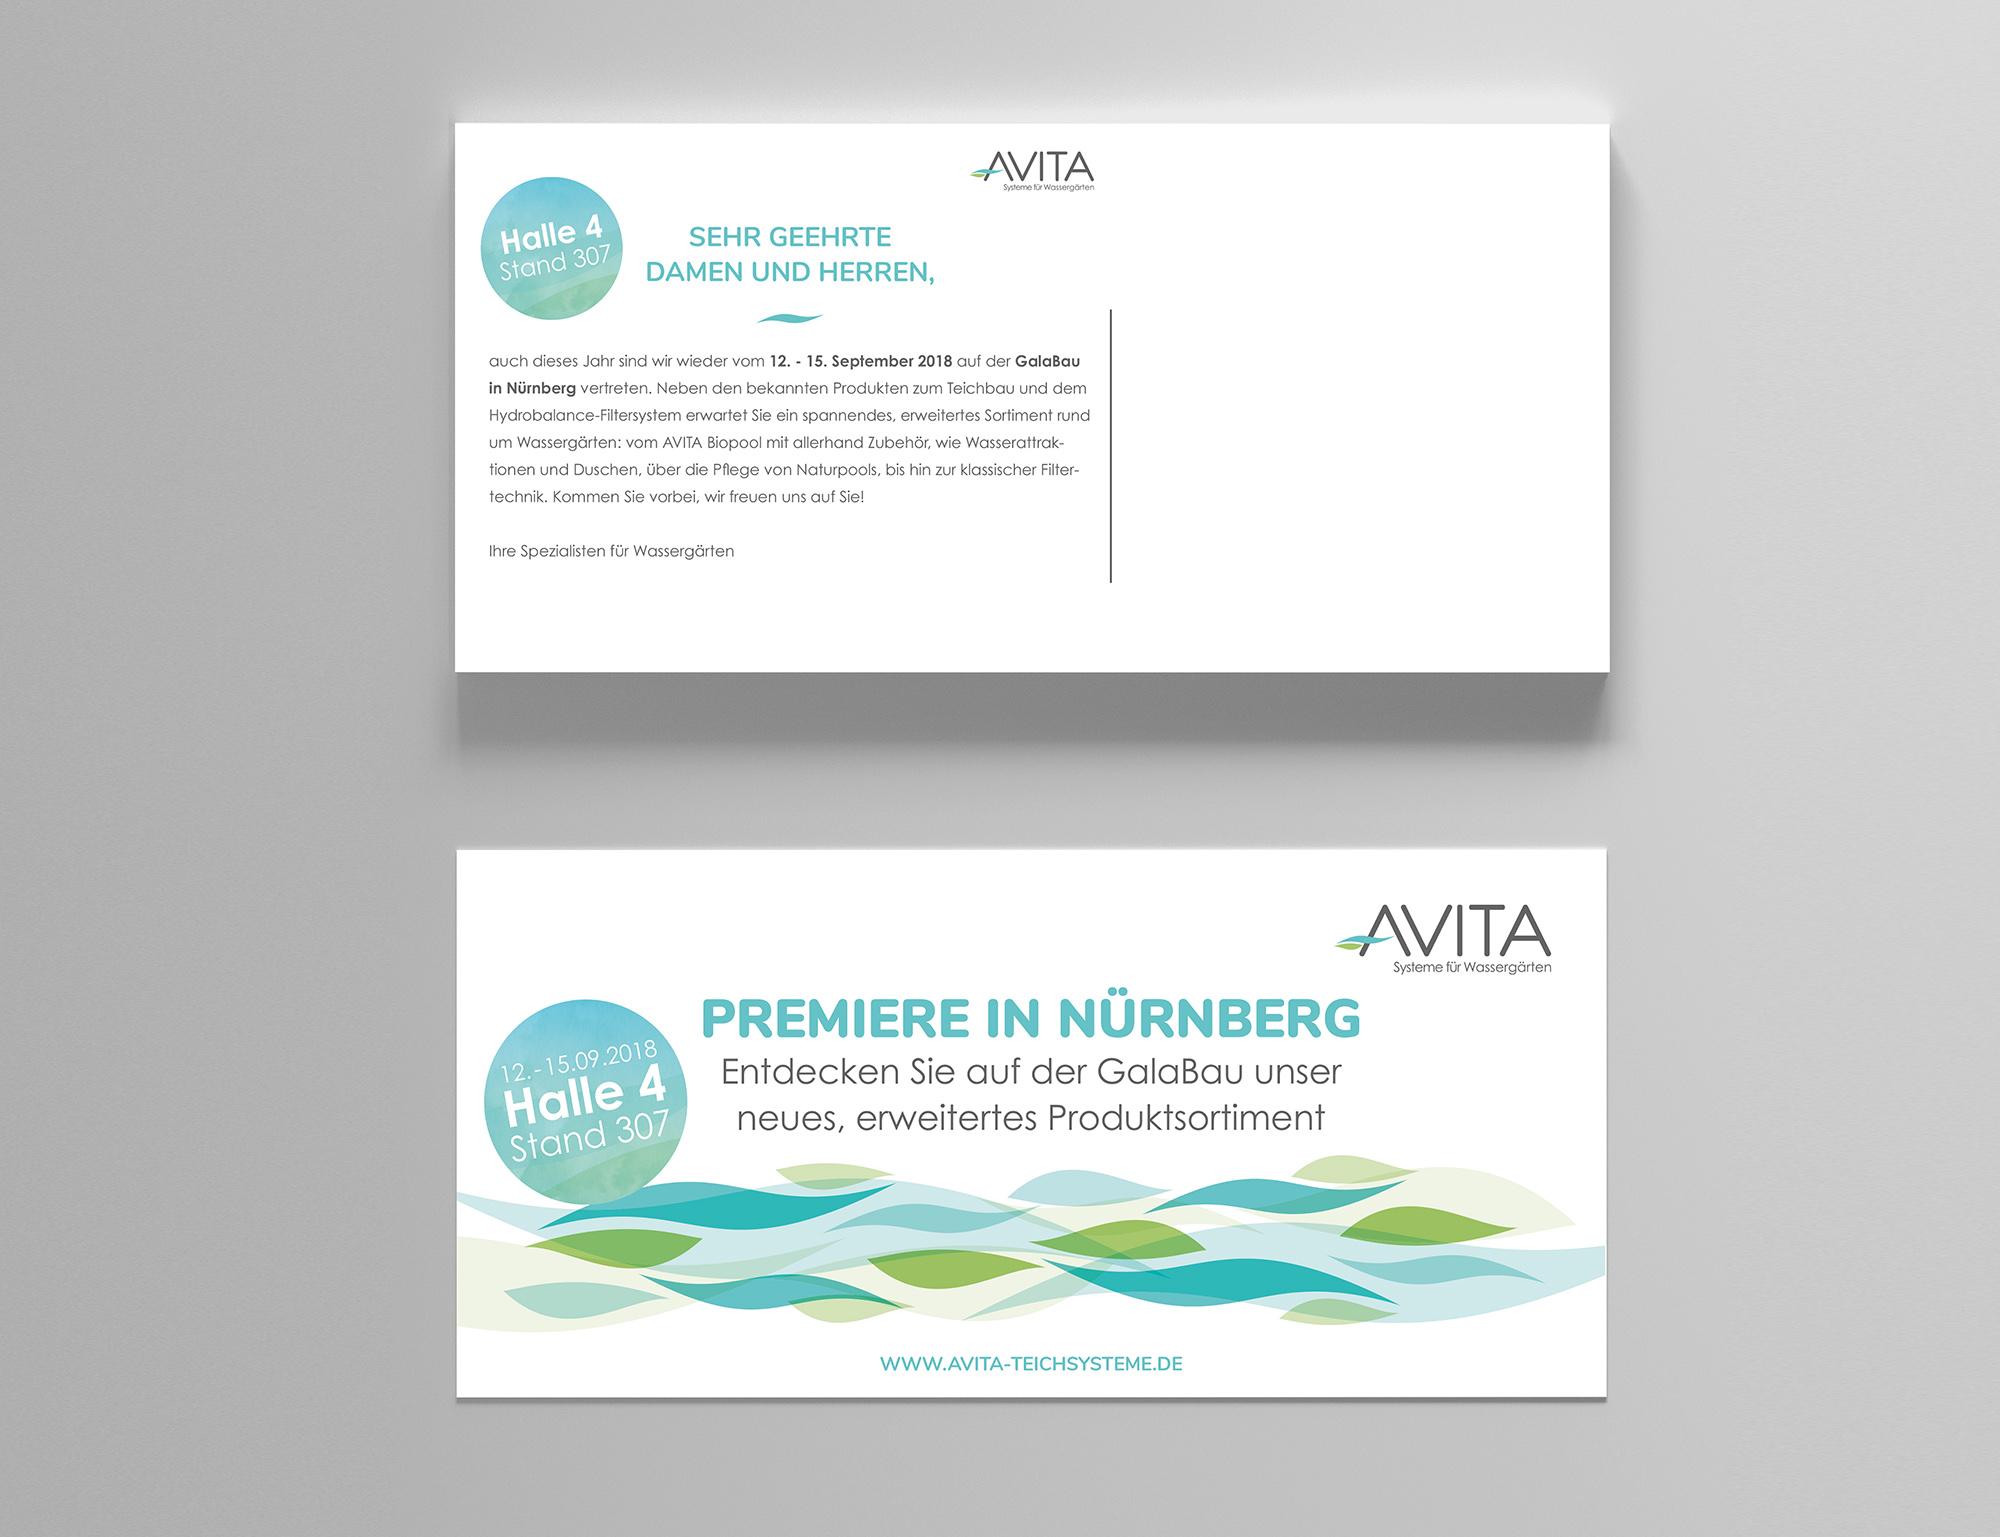 AVITA_Mailing_Messe_WEB.jpg